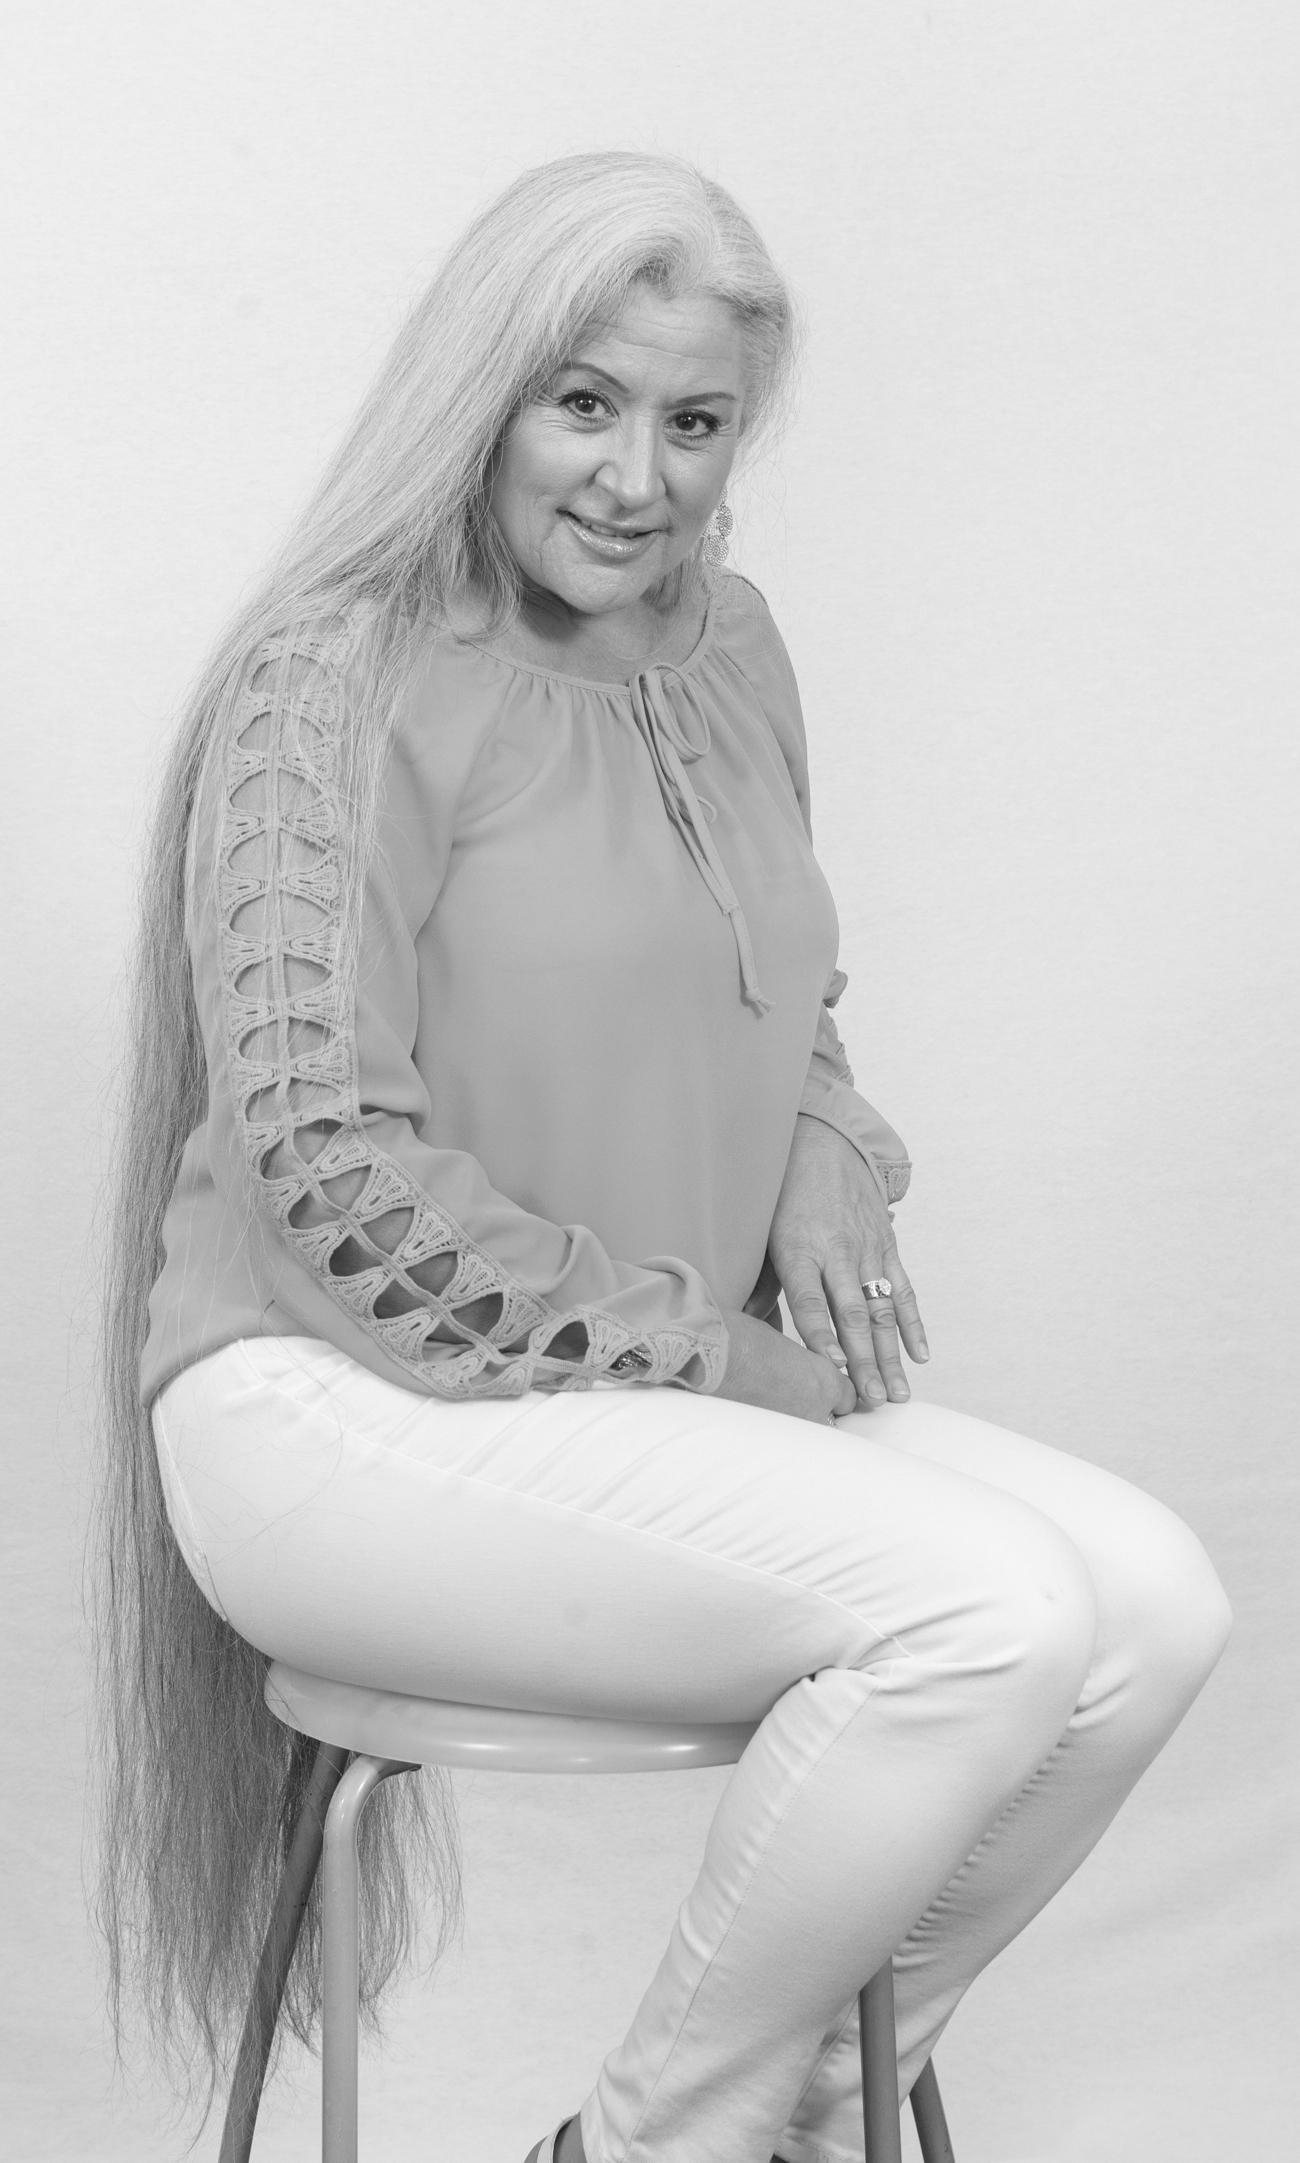 Lizz Rivas-Smith